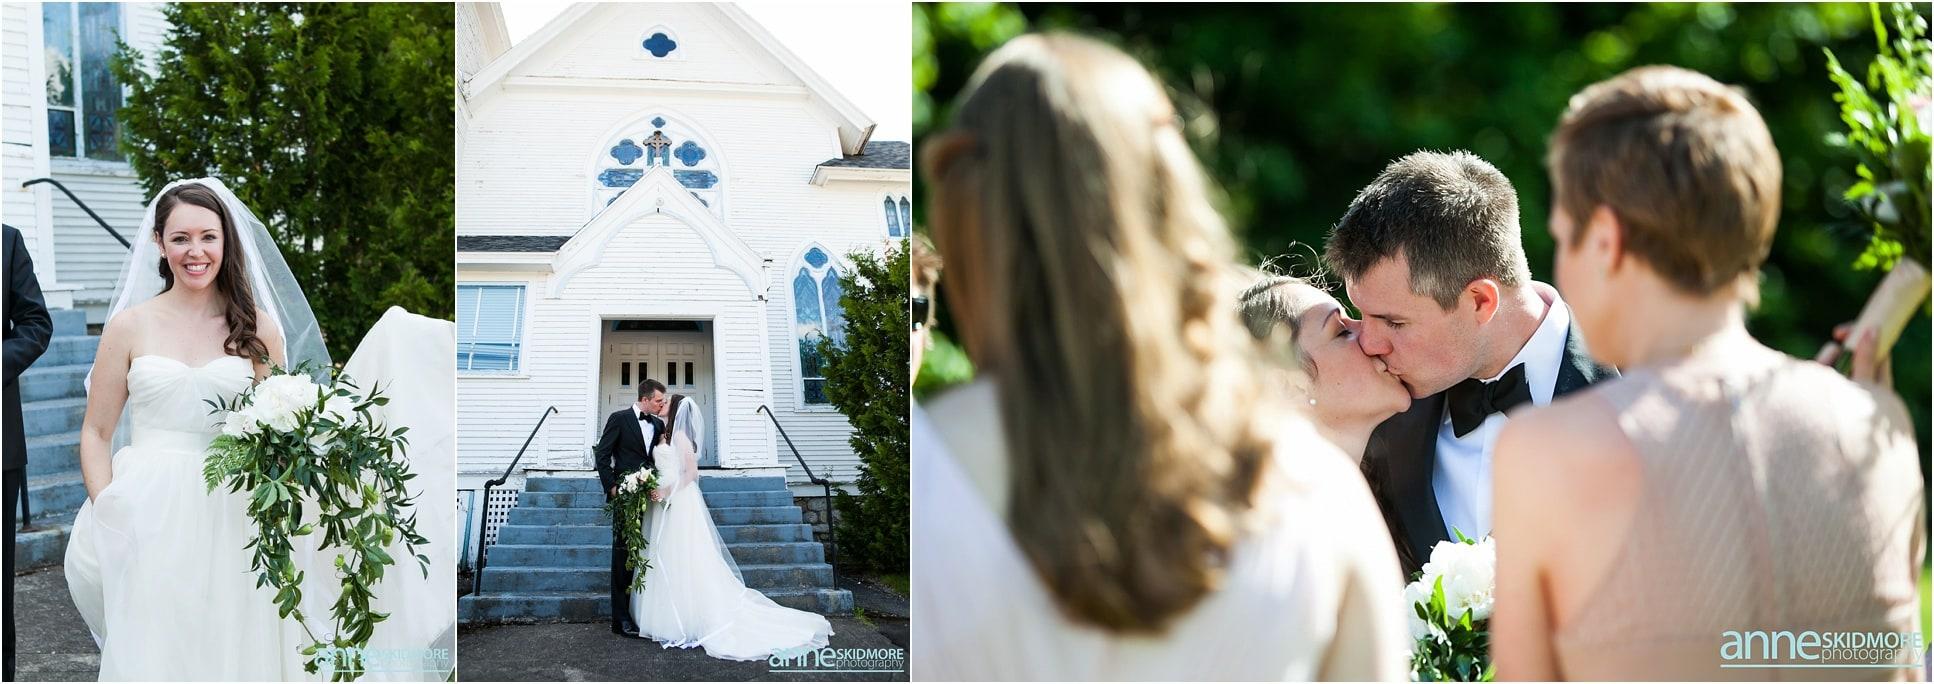 Omni_Mount_Washington_Wedding_0032